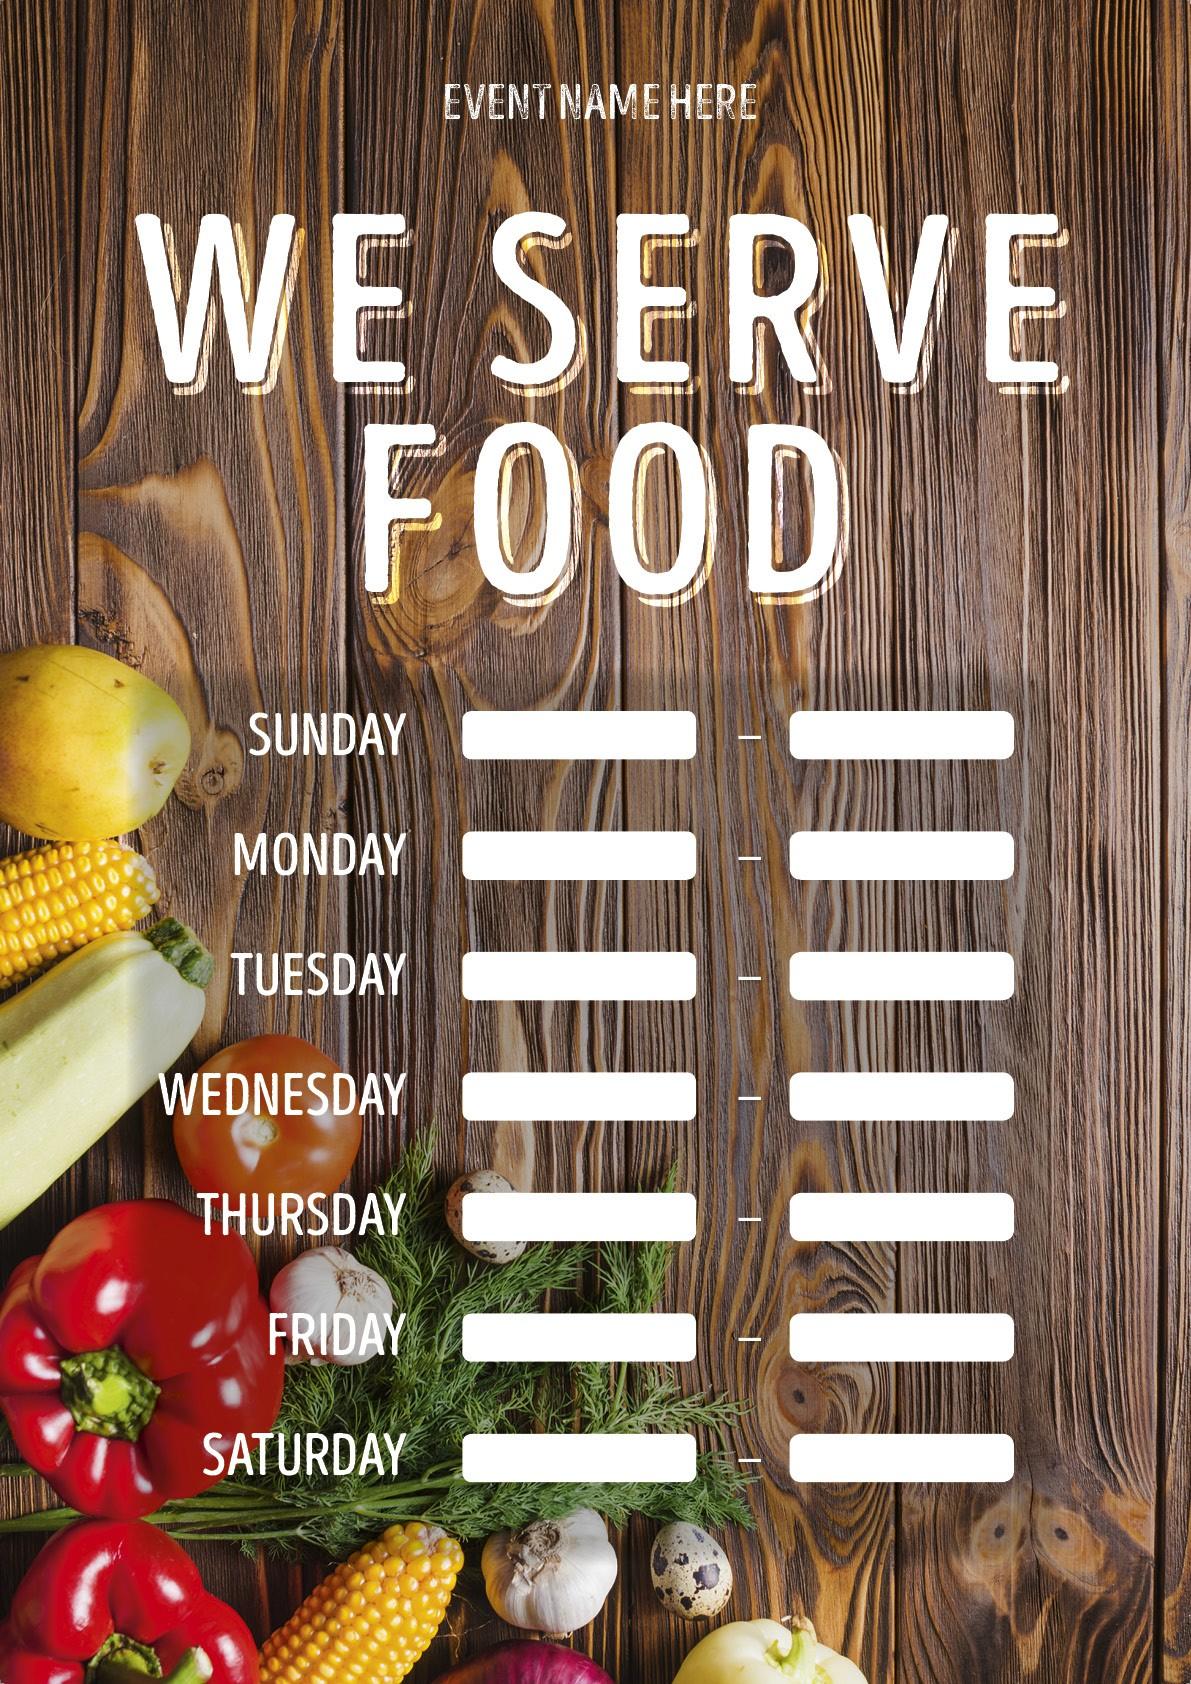 We Serve Food (times) Poster 5